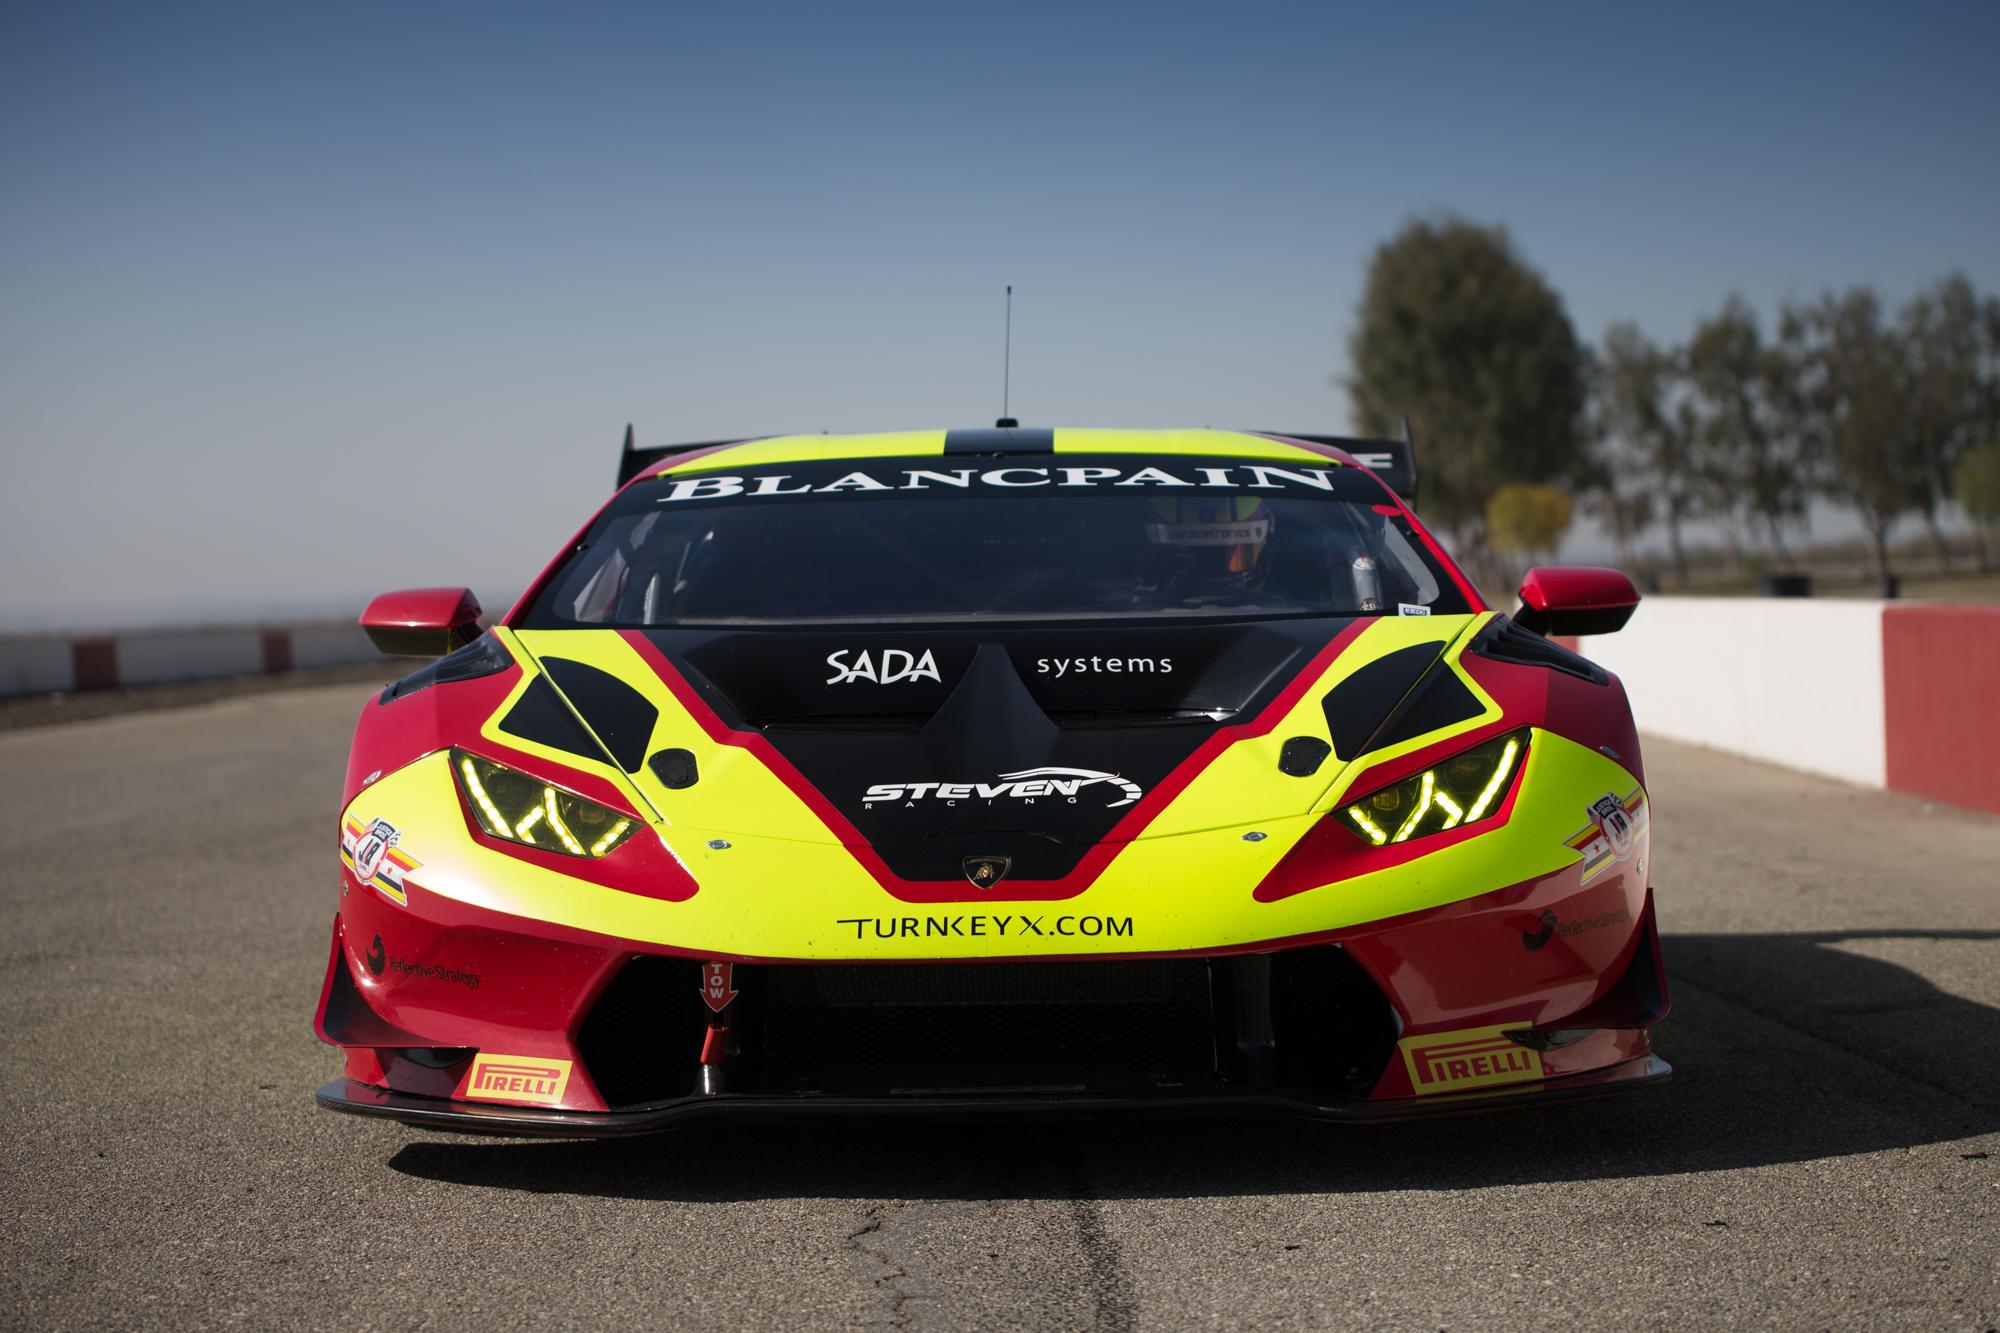 Steven-Racing-20171027-53655.jpg